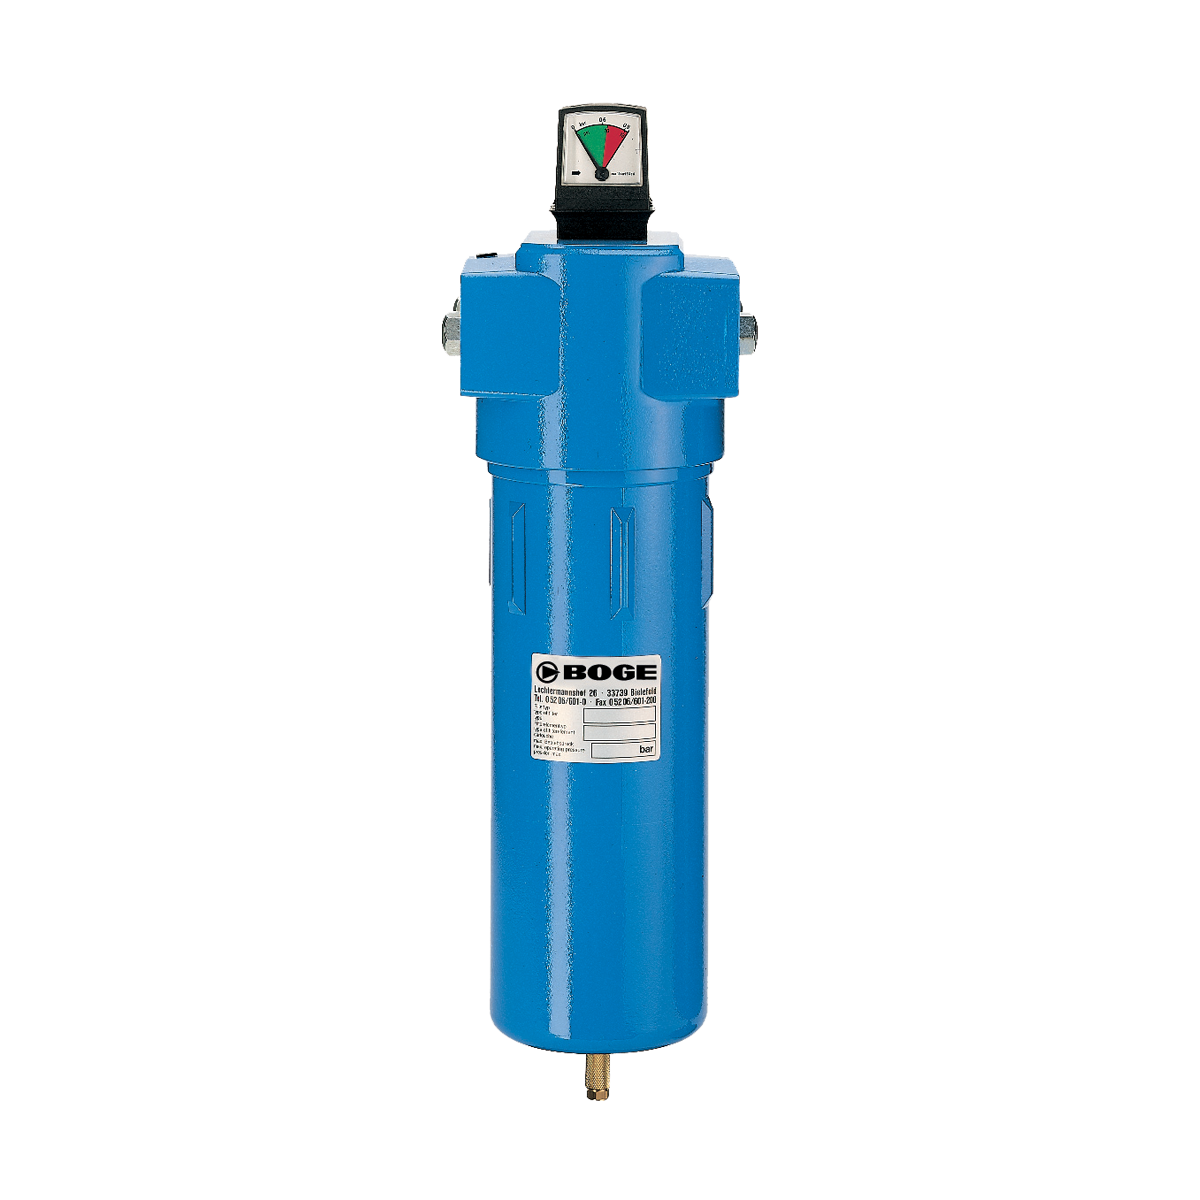 Boge Compressors High Pressure Pre Filter 25 Bar